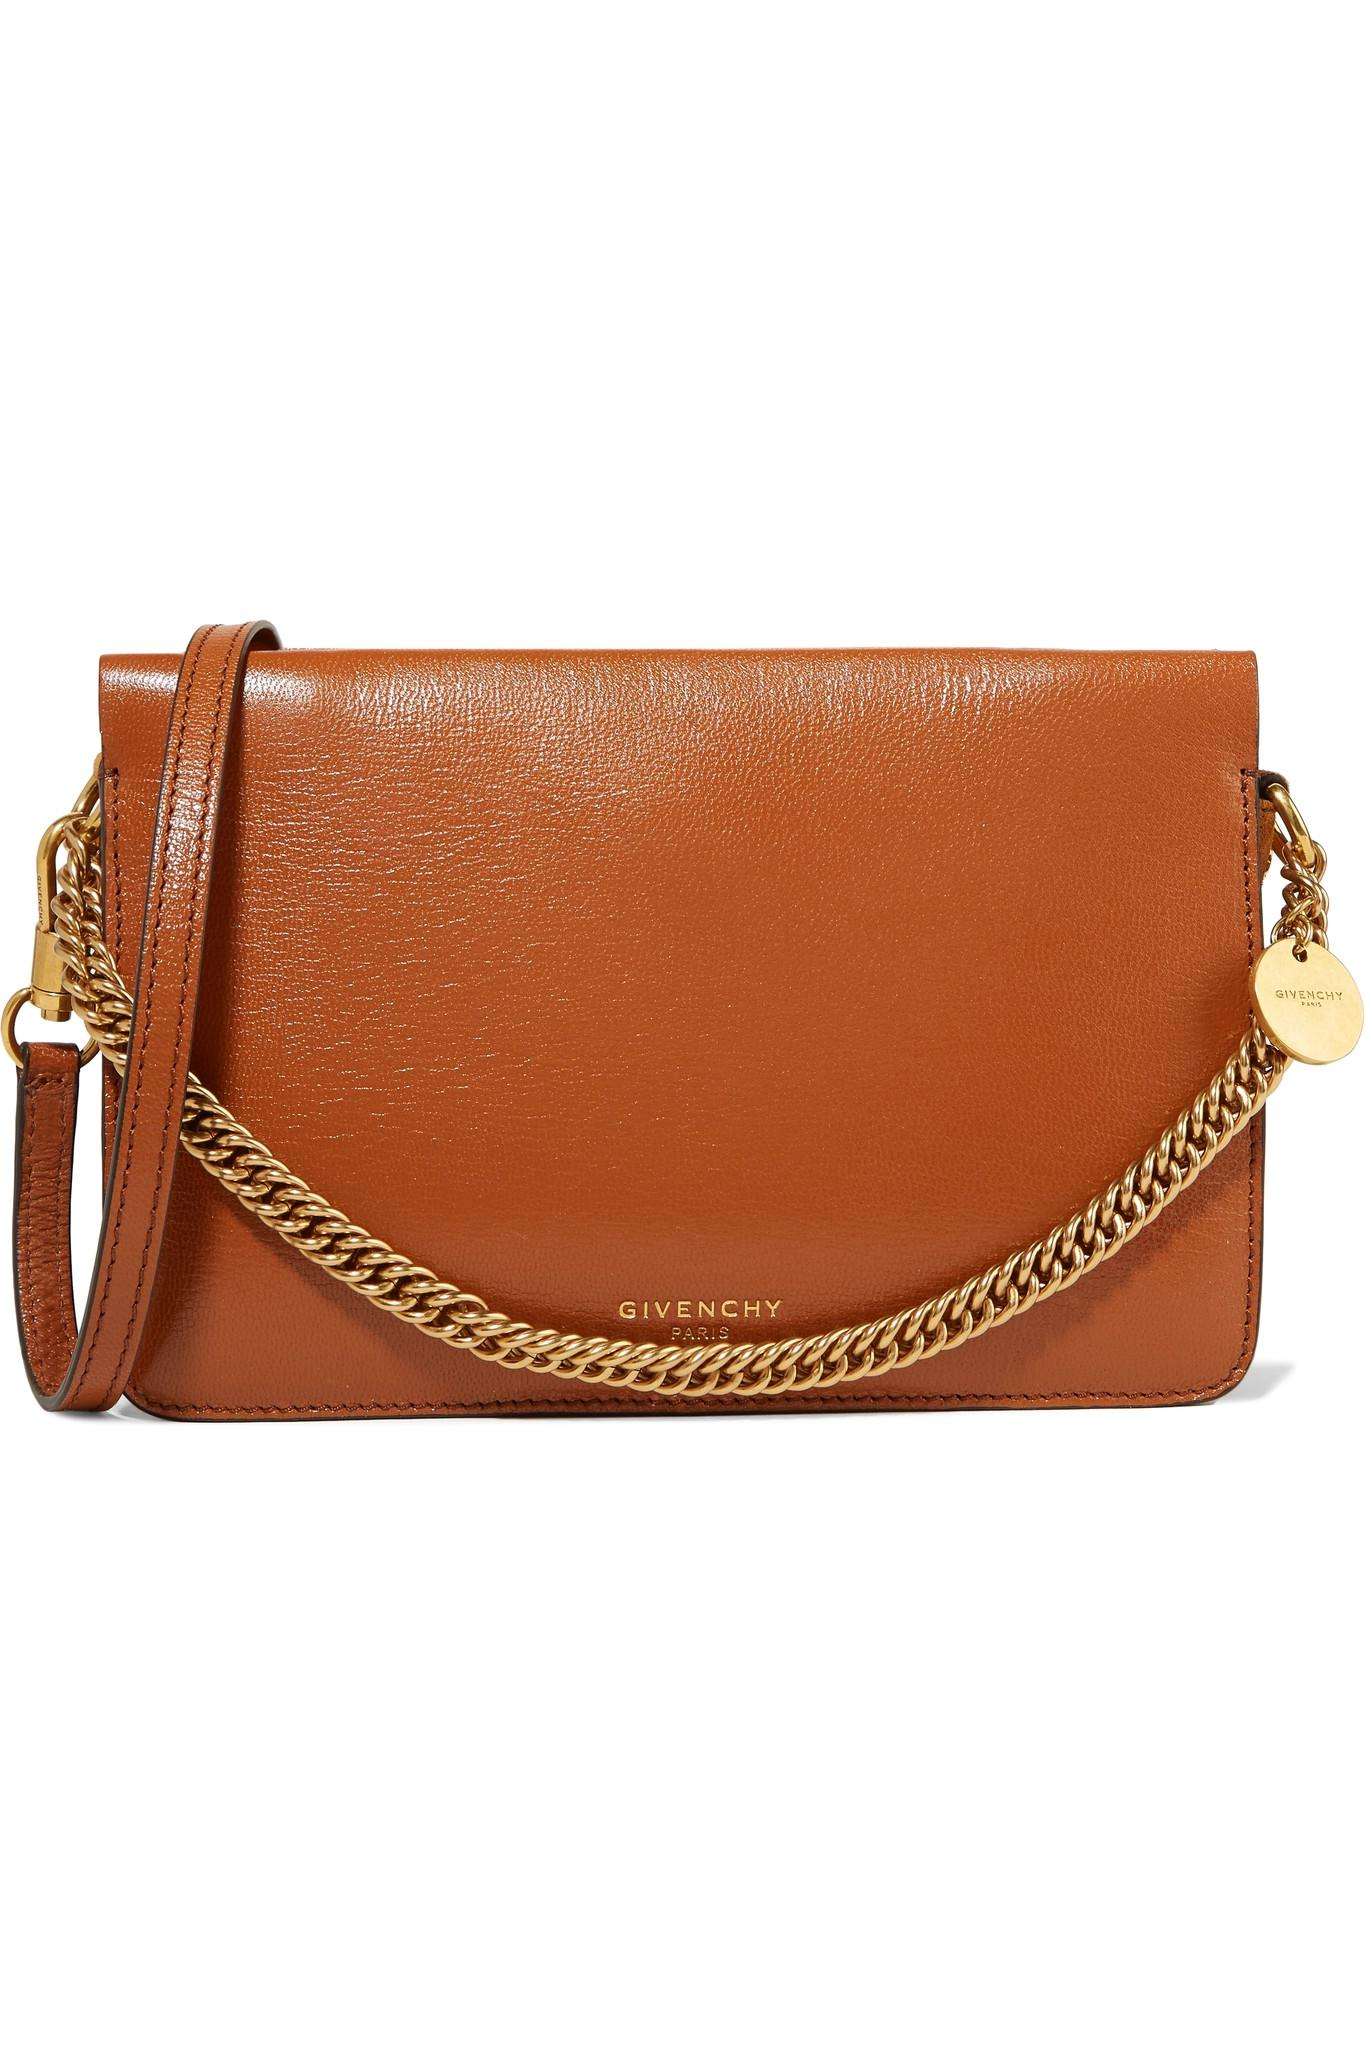 6273ee7dff0 Givenchy Gv Cross Suede-trimmed Leather Shoulder Bag in Brown - Lyst